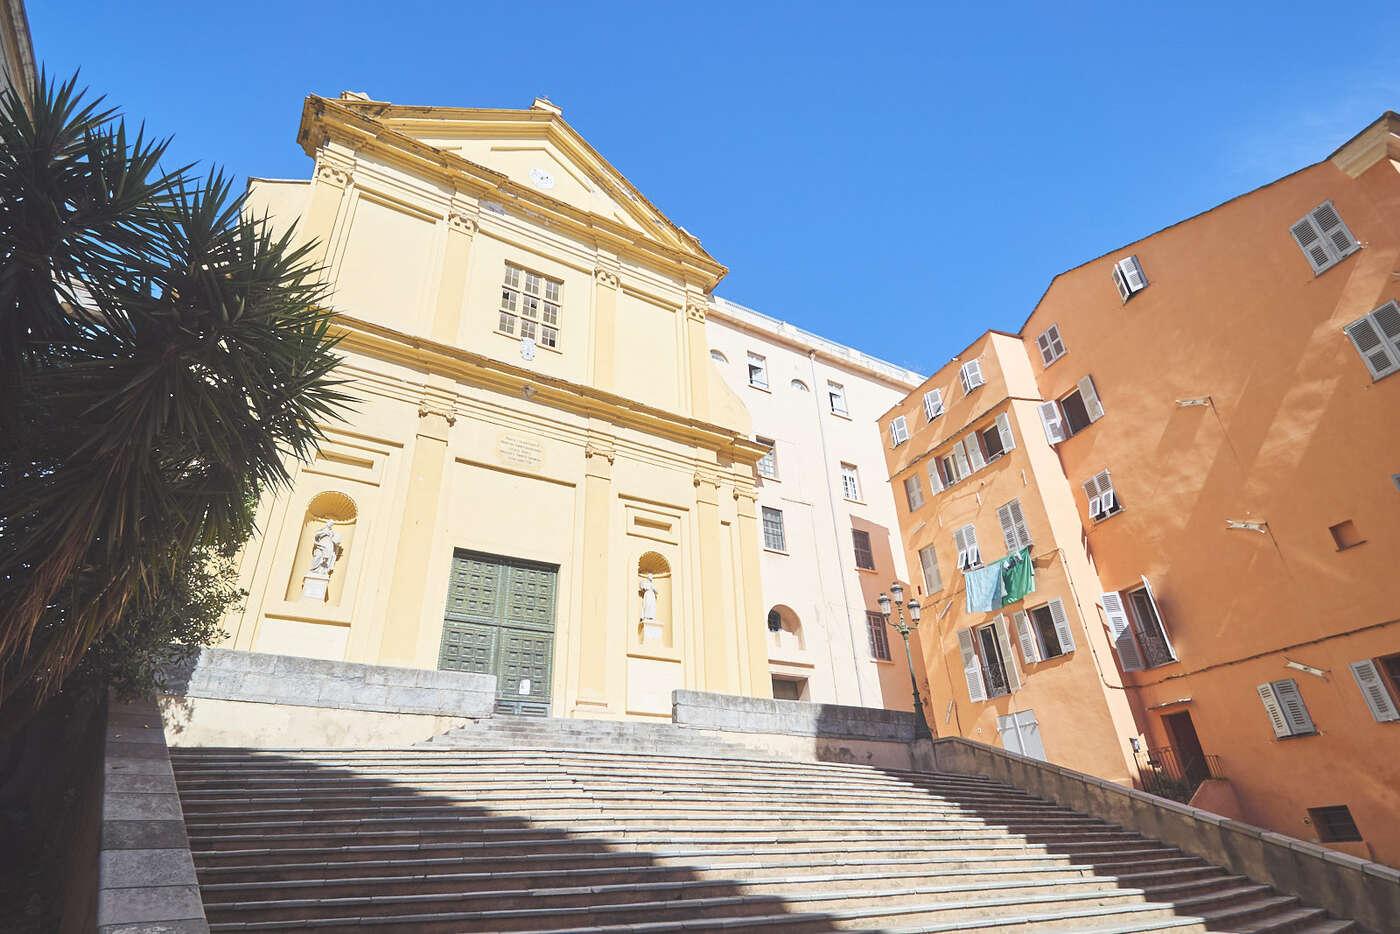 Eglise à Bastia